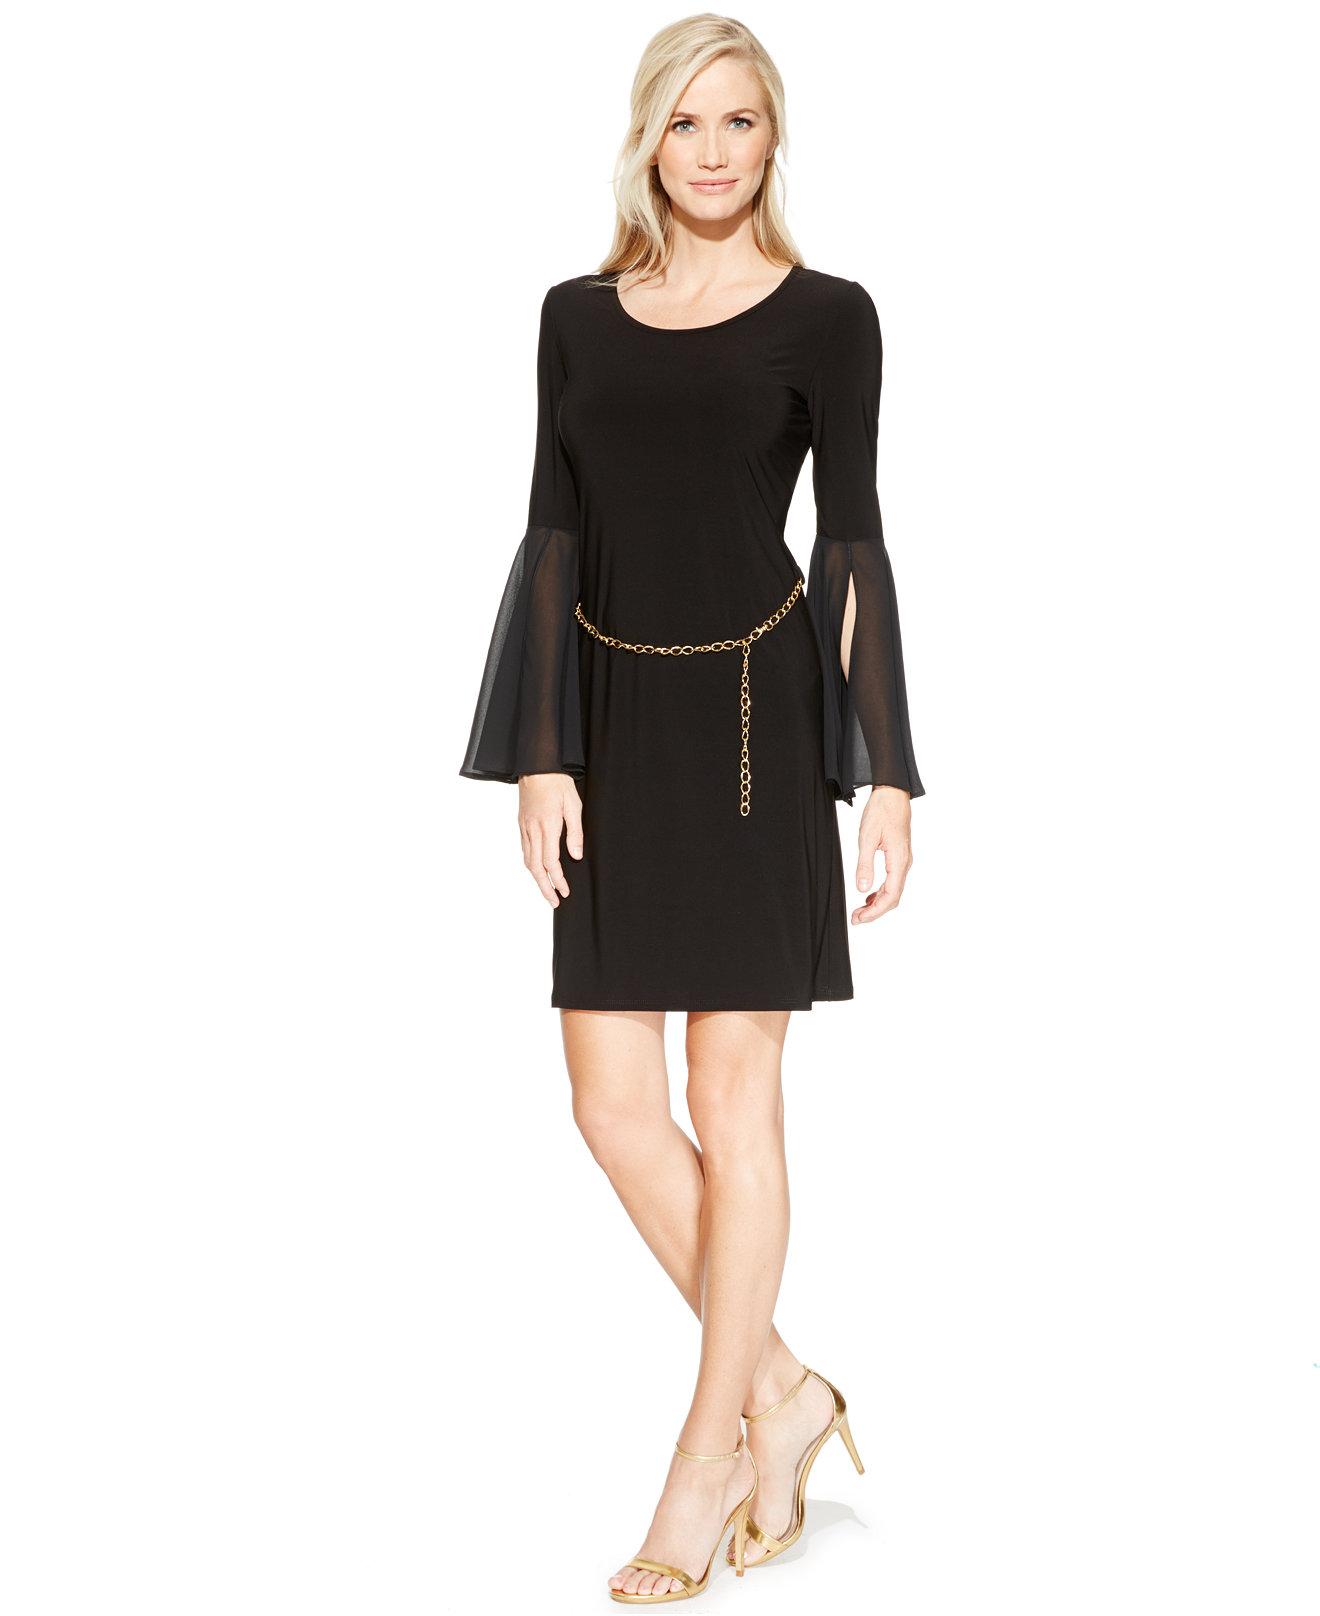 Evan Picone Black Dresses